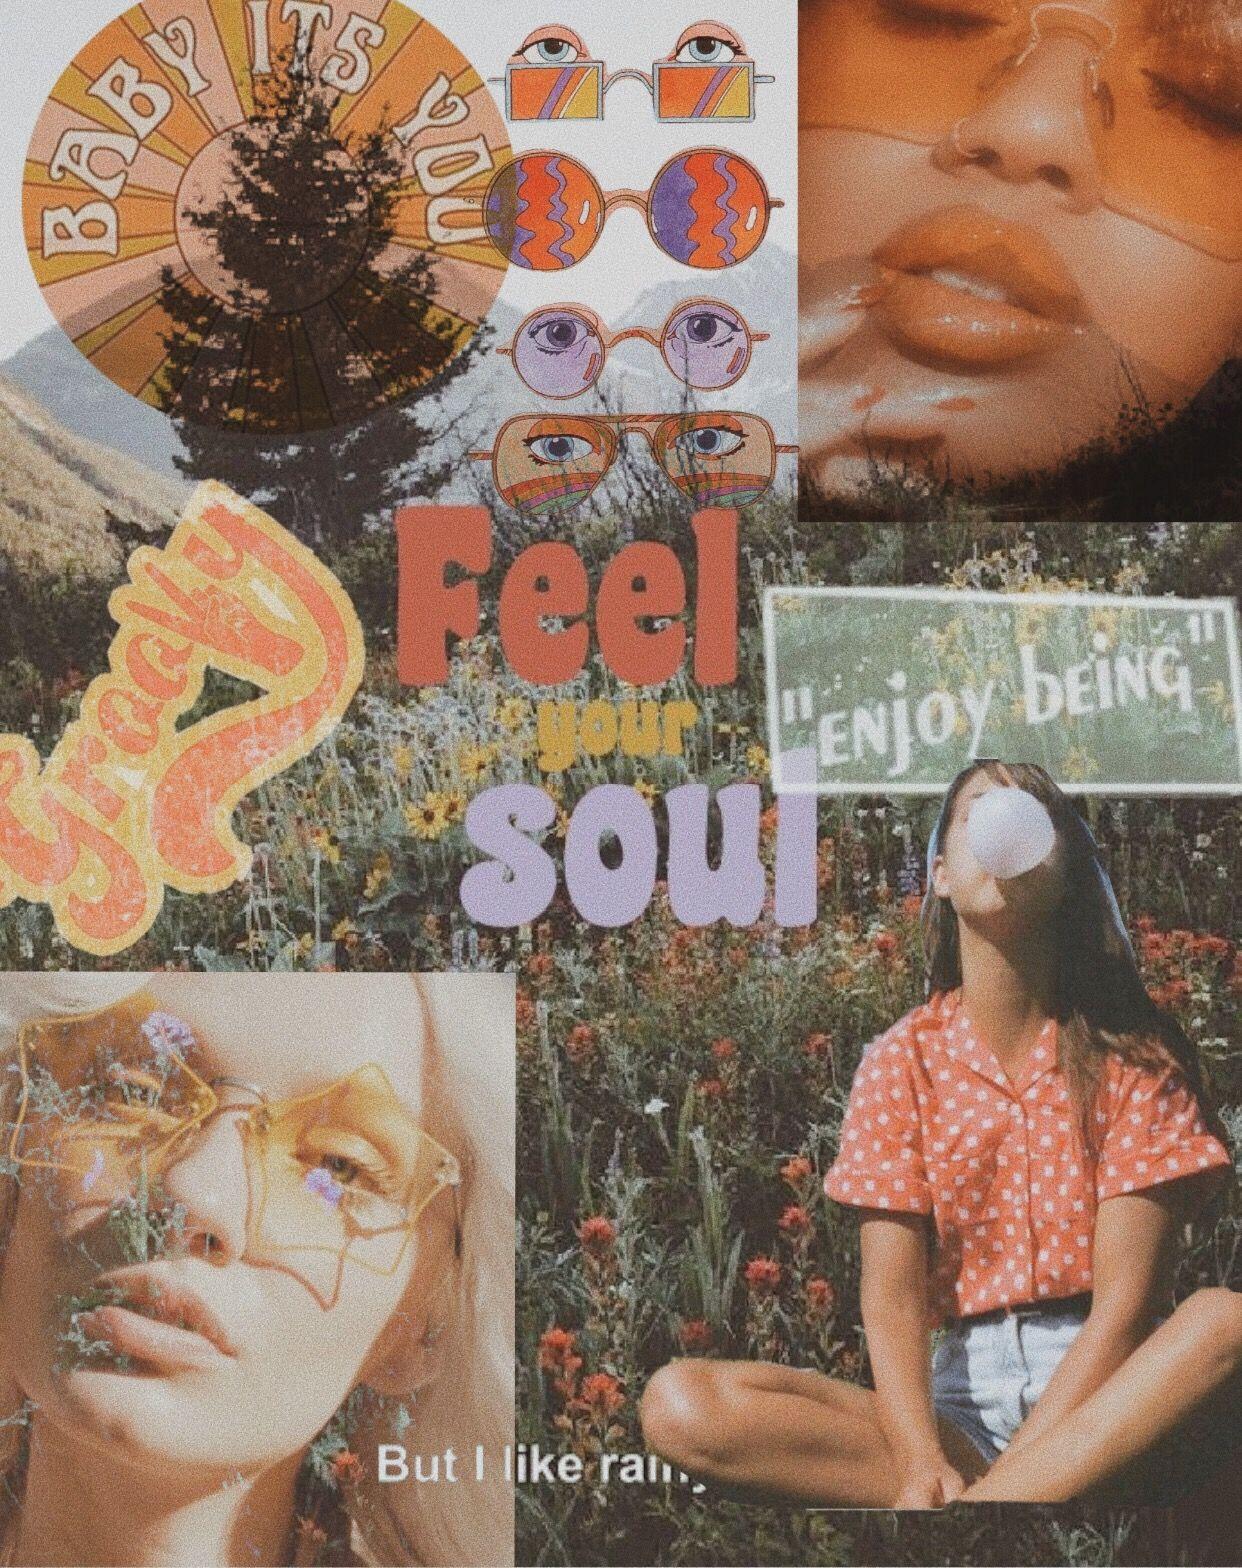 70s Aesthetic Aesthetic Collage 70s Aesthetic Aesthetic Wallpapers